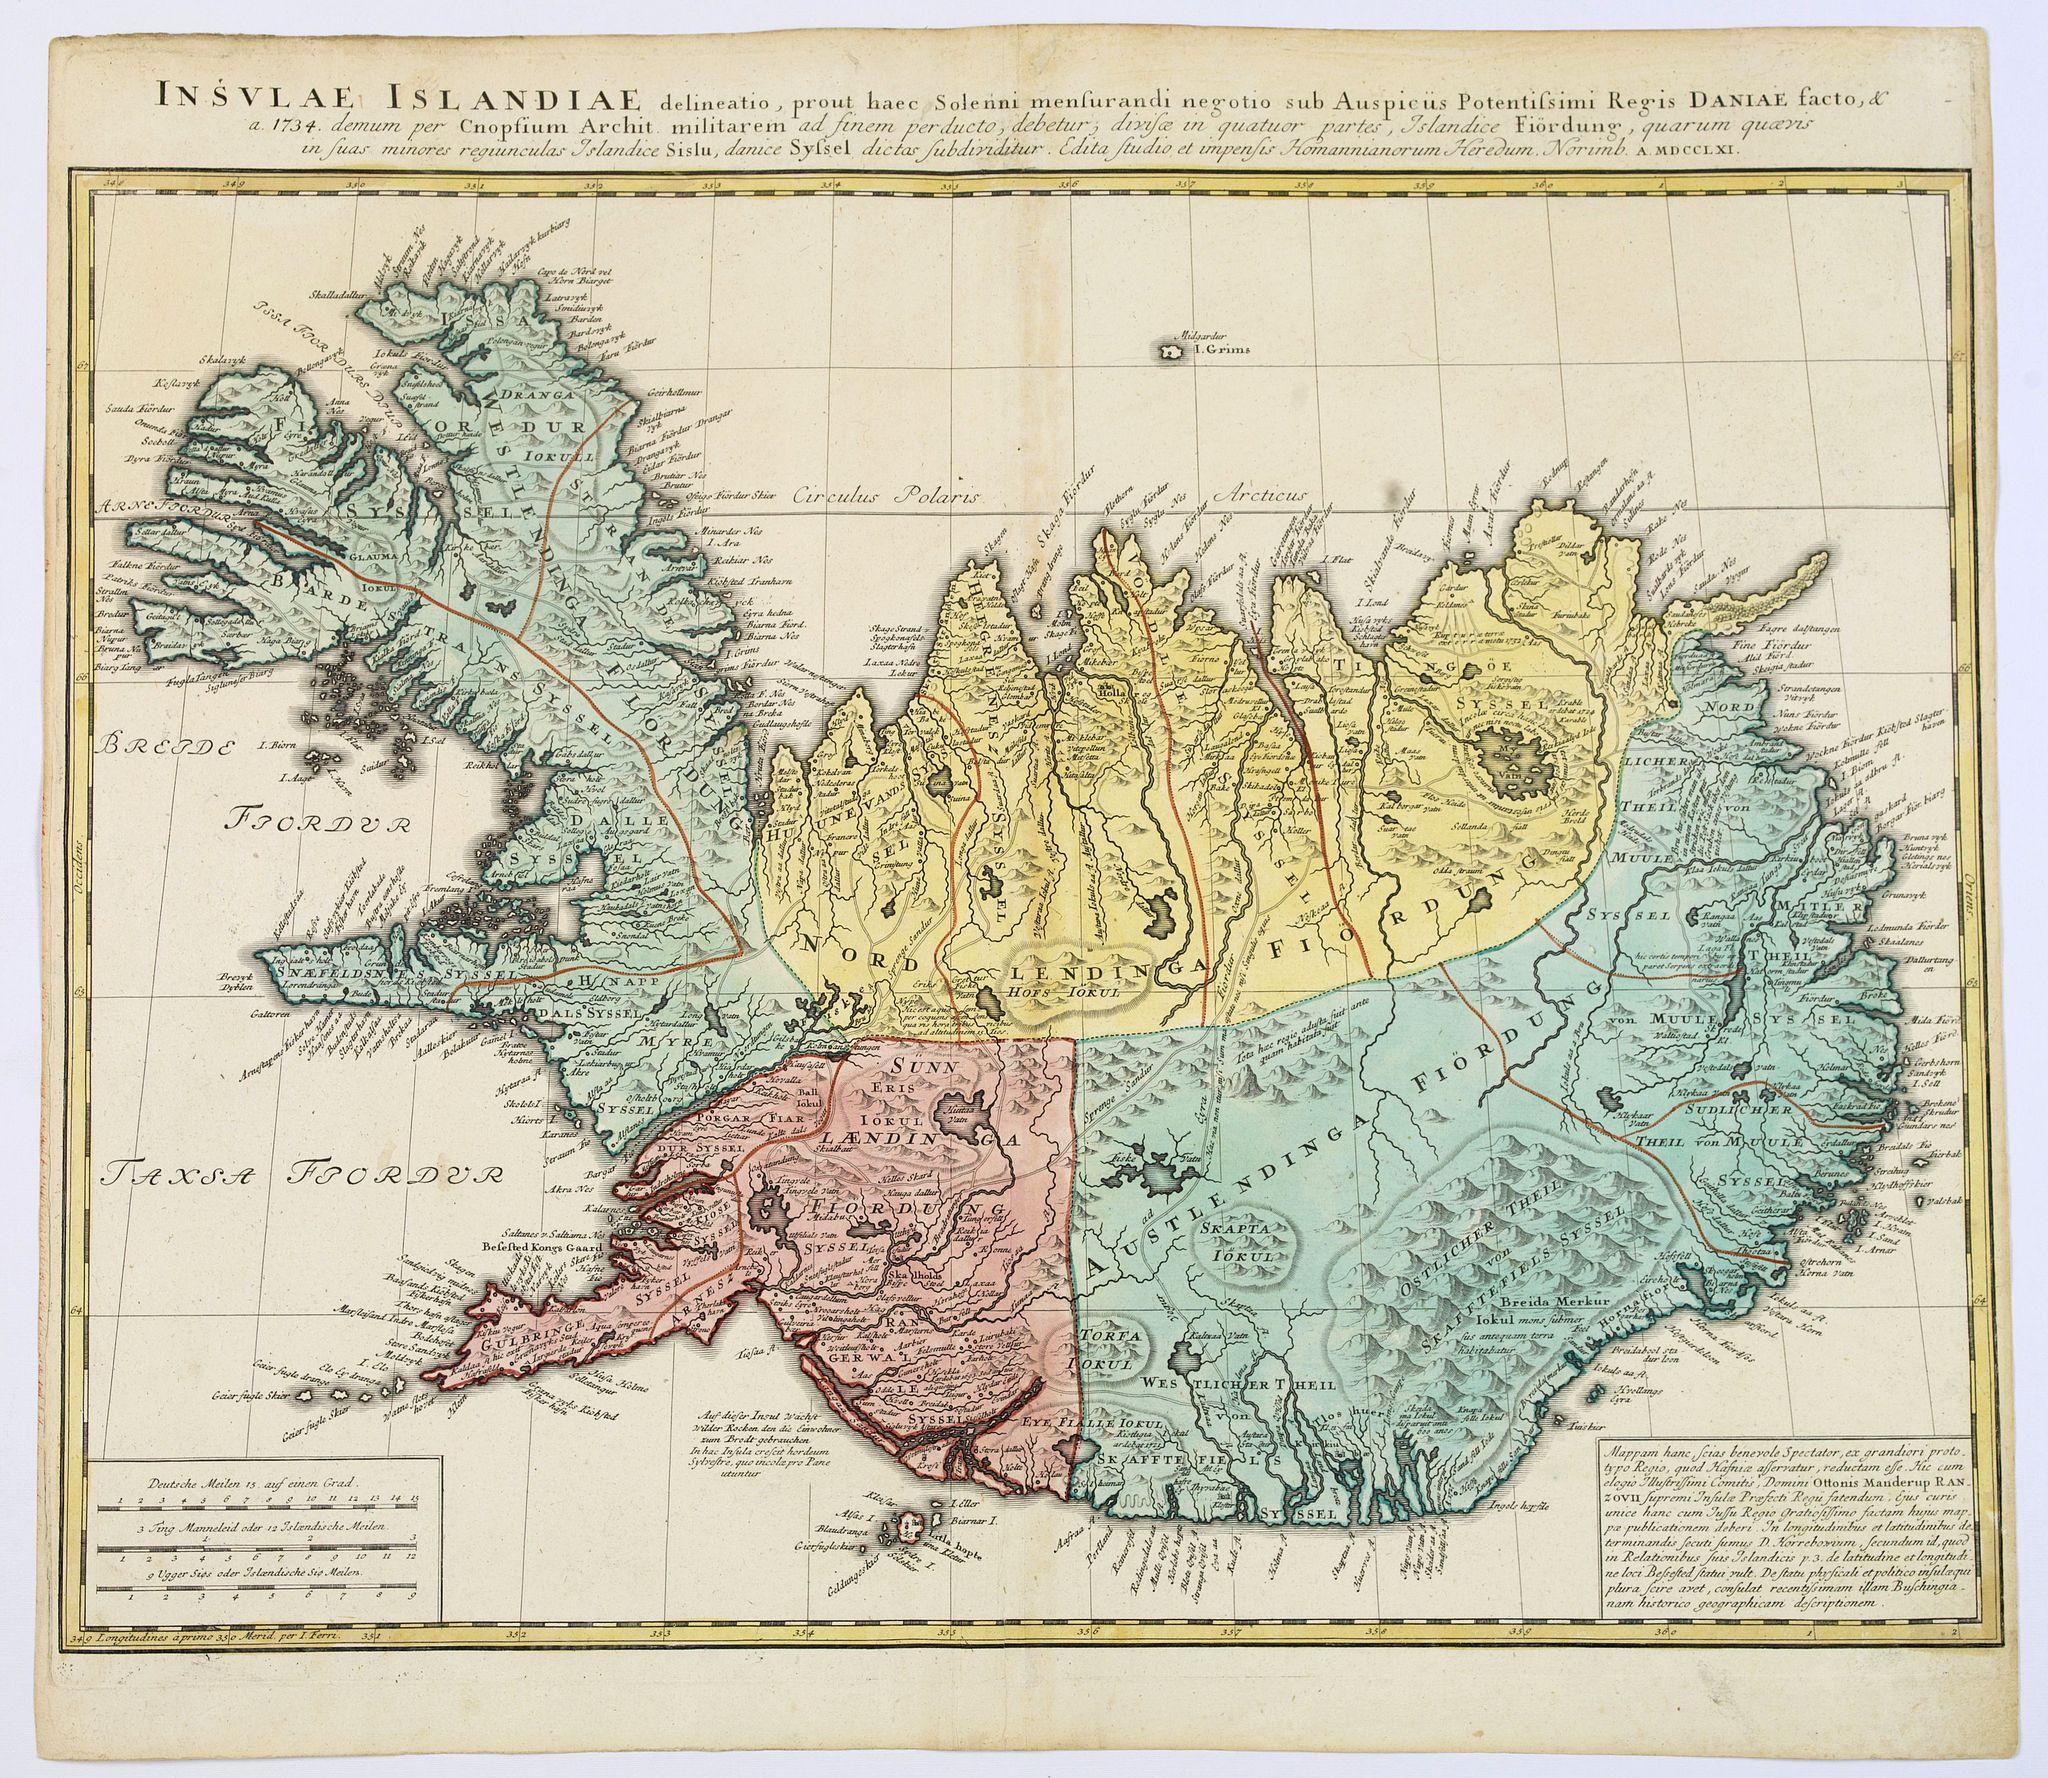 HOMANN HEIRS. -  Insula Islandiae delineatio. . .